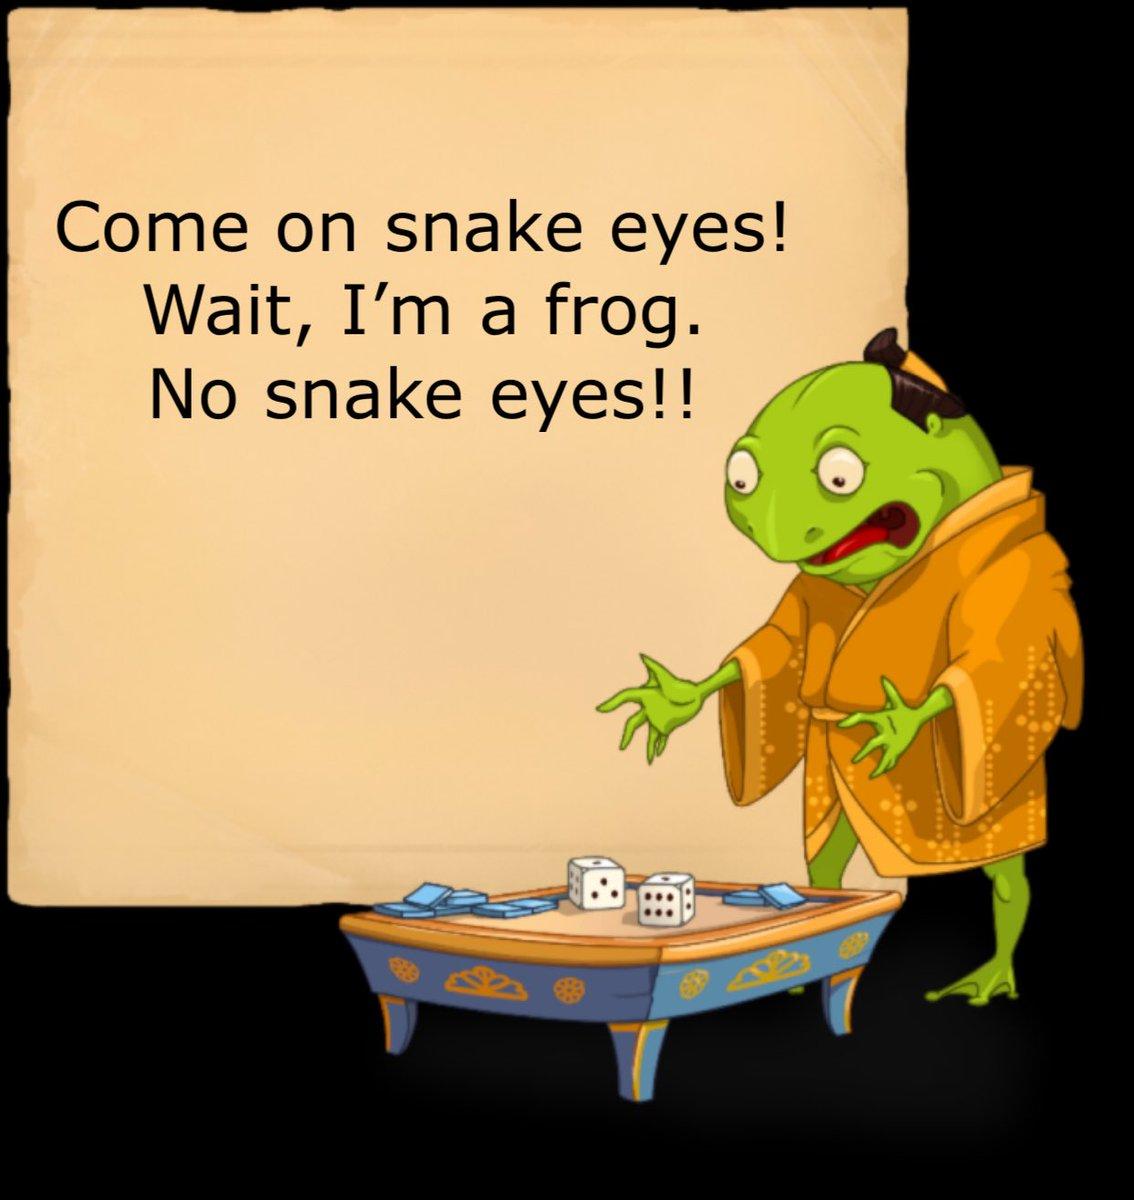 Bad idea #frog. U-Ge! isn't played that way #games #indiegames #boardgames #indiegamedev #gamergirl #gamenight #newgame #gamerpic.twitter.com/jARbdm4GrG